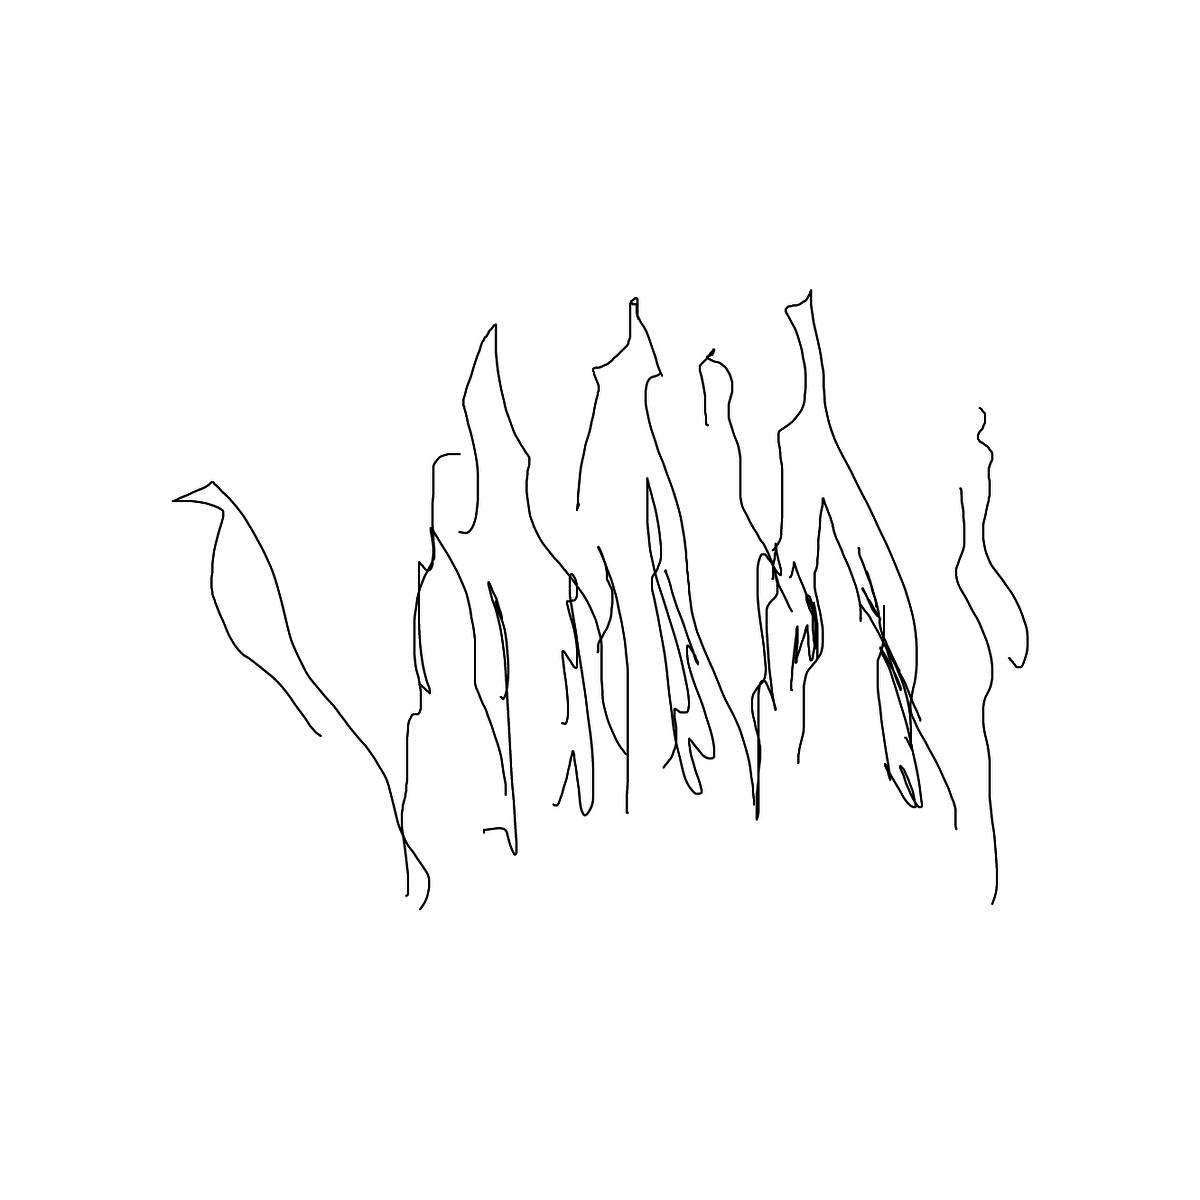 BAAAM drawing#17479 lat:50.0999450683593750lng: 8.7723245620727540